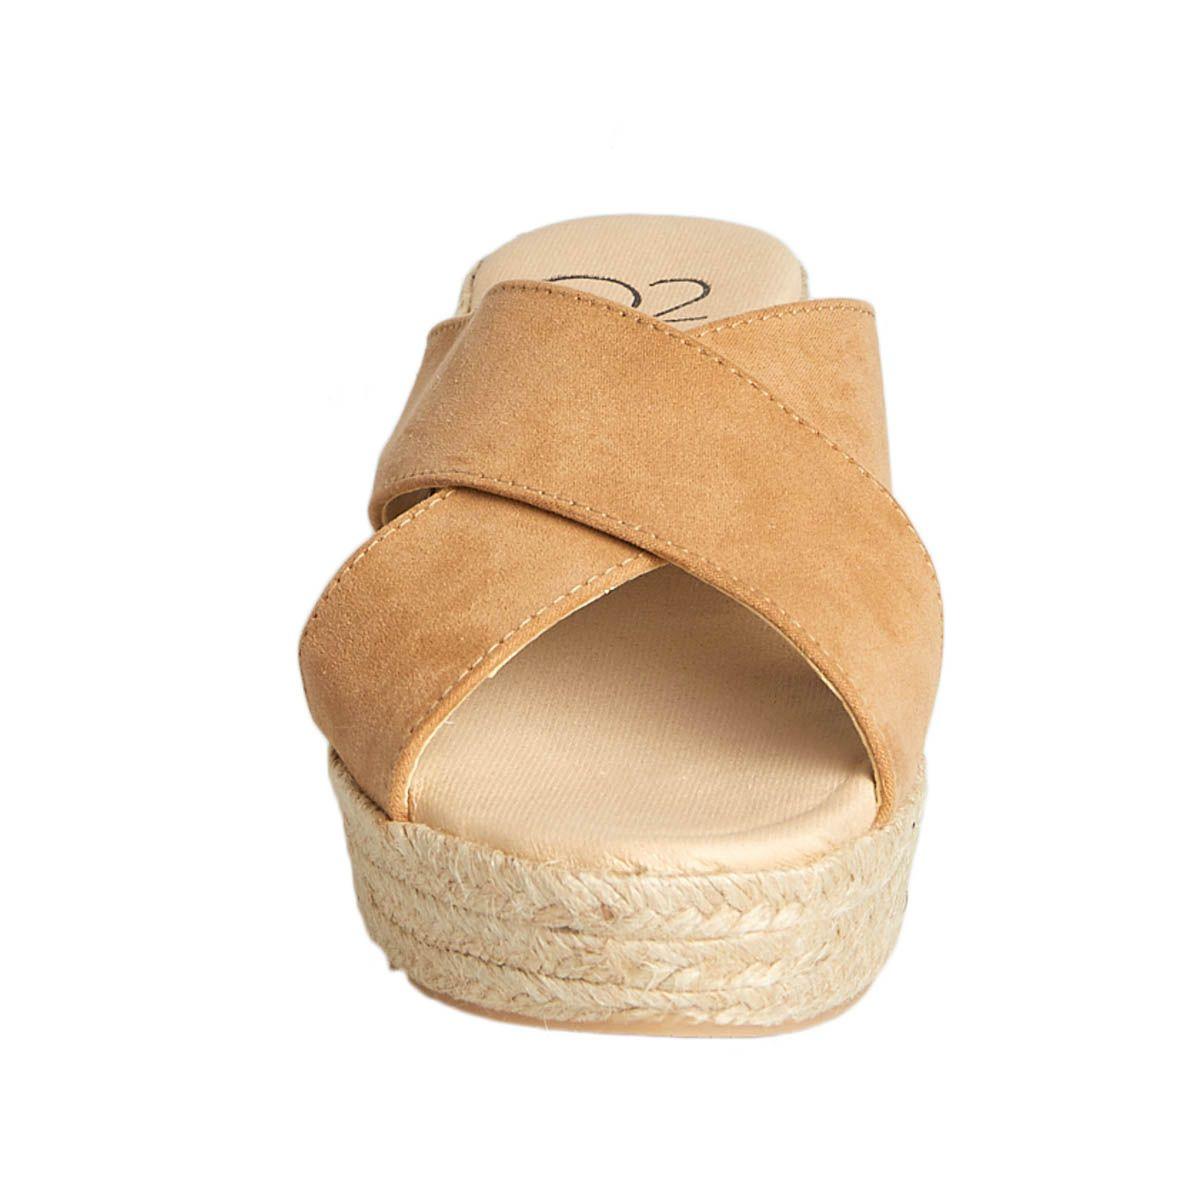 Leindia Sparto Wedge Sandal in Brown